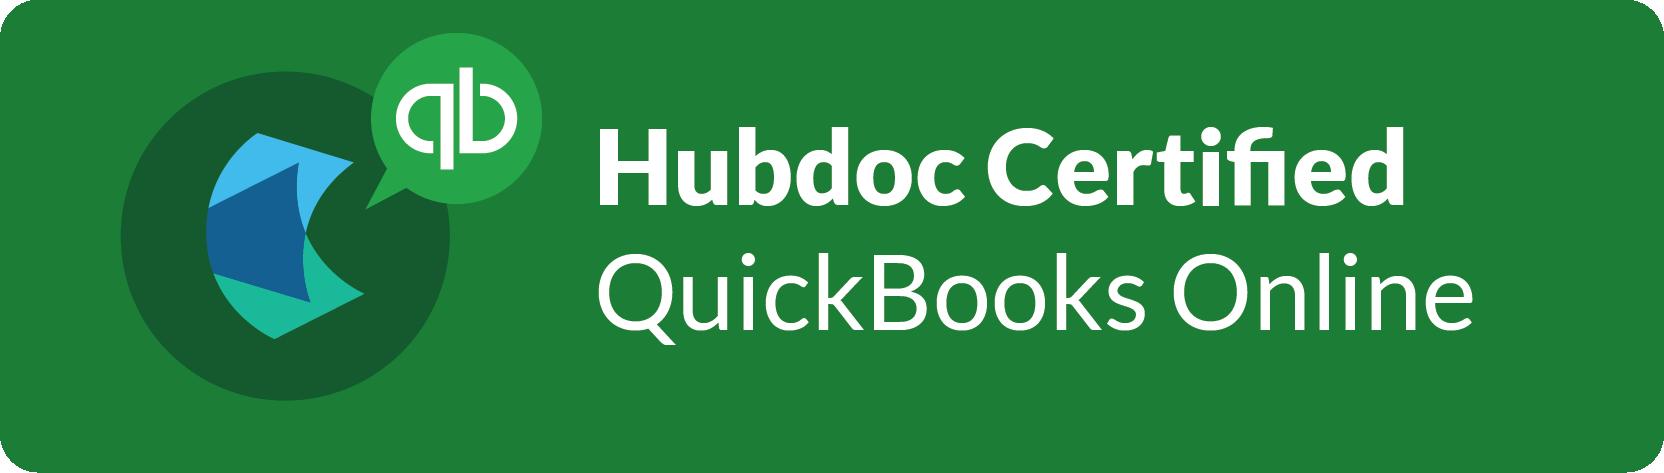 Hubdoc QuickBooks Online Certification